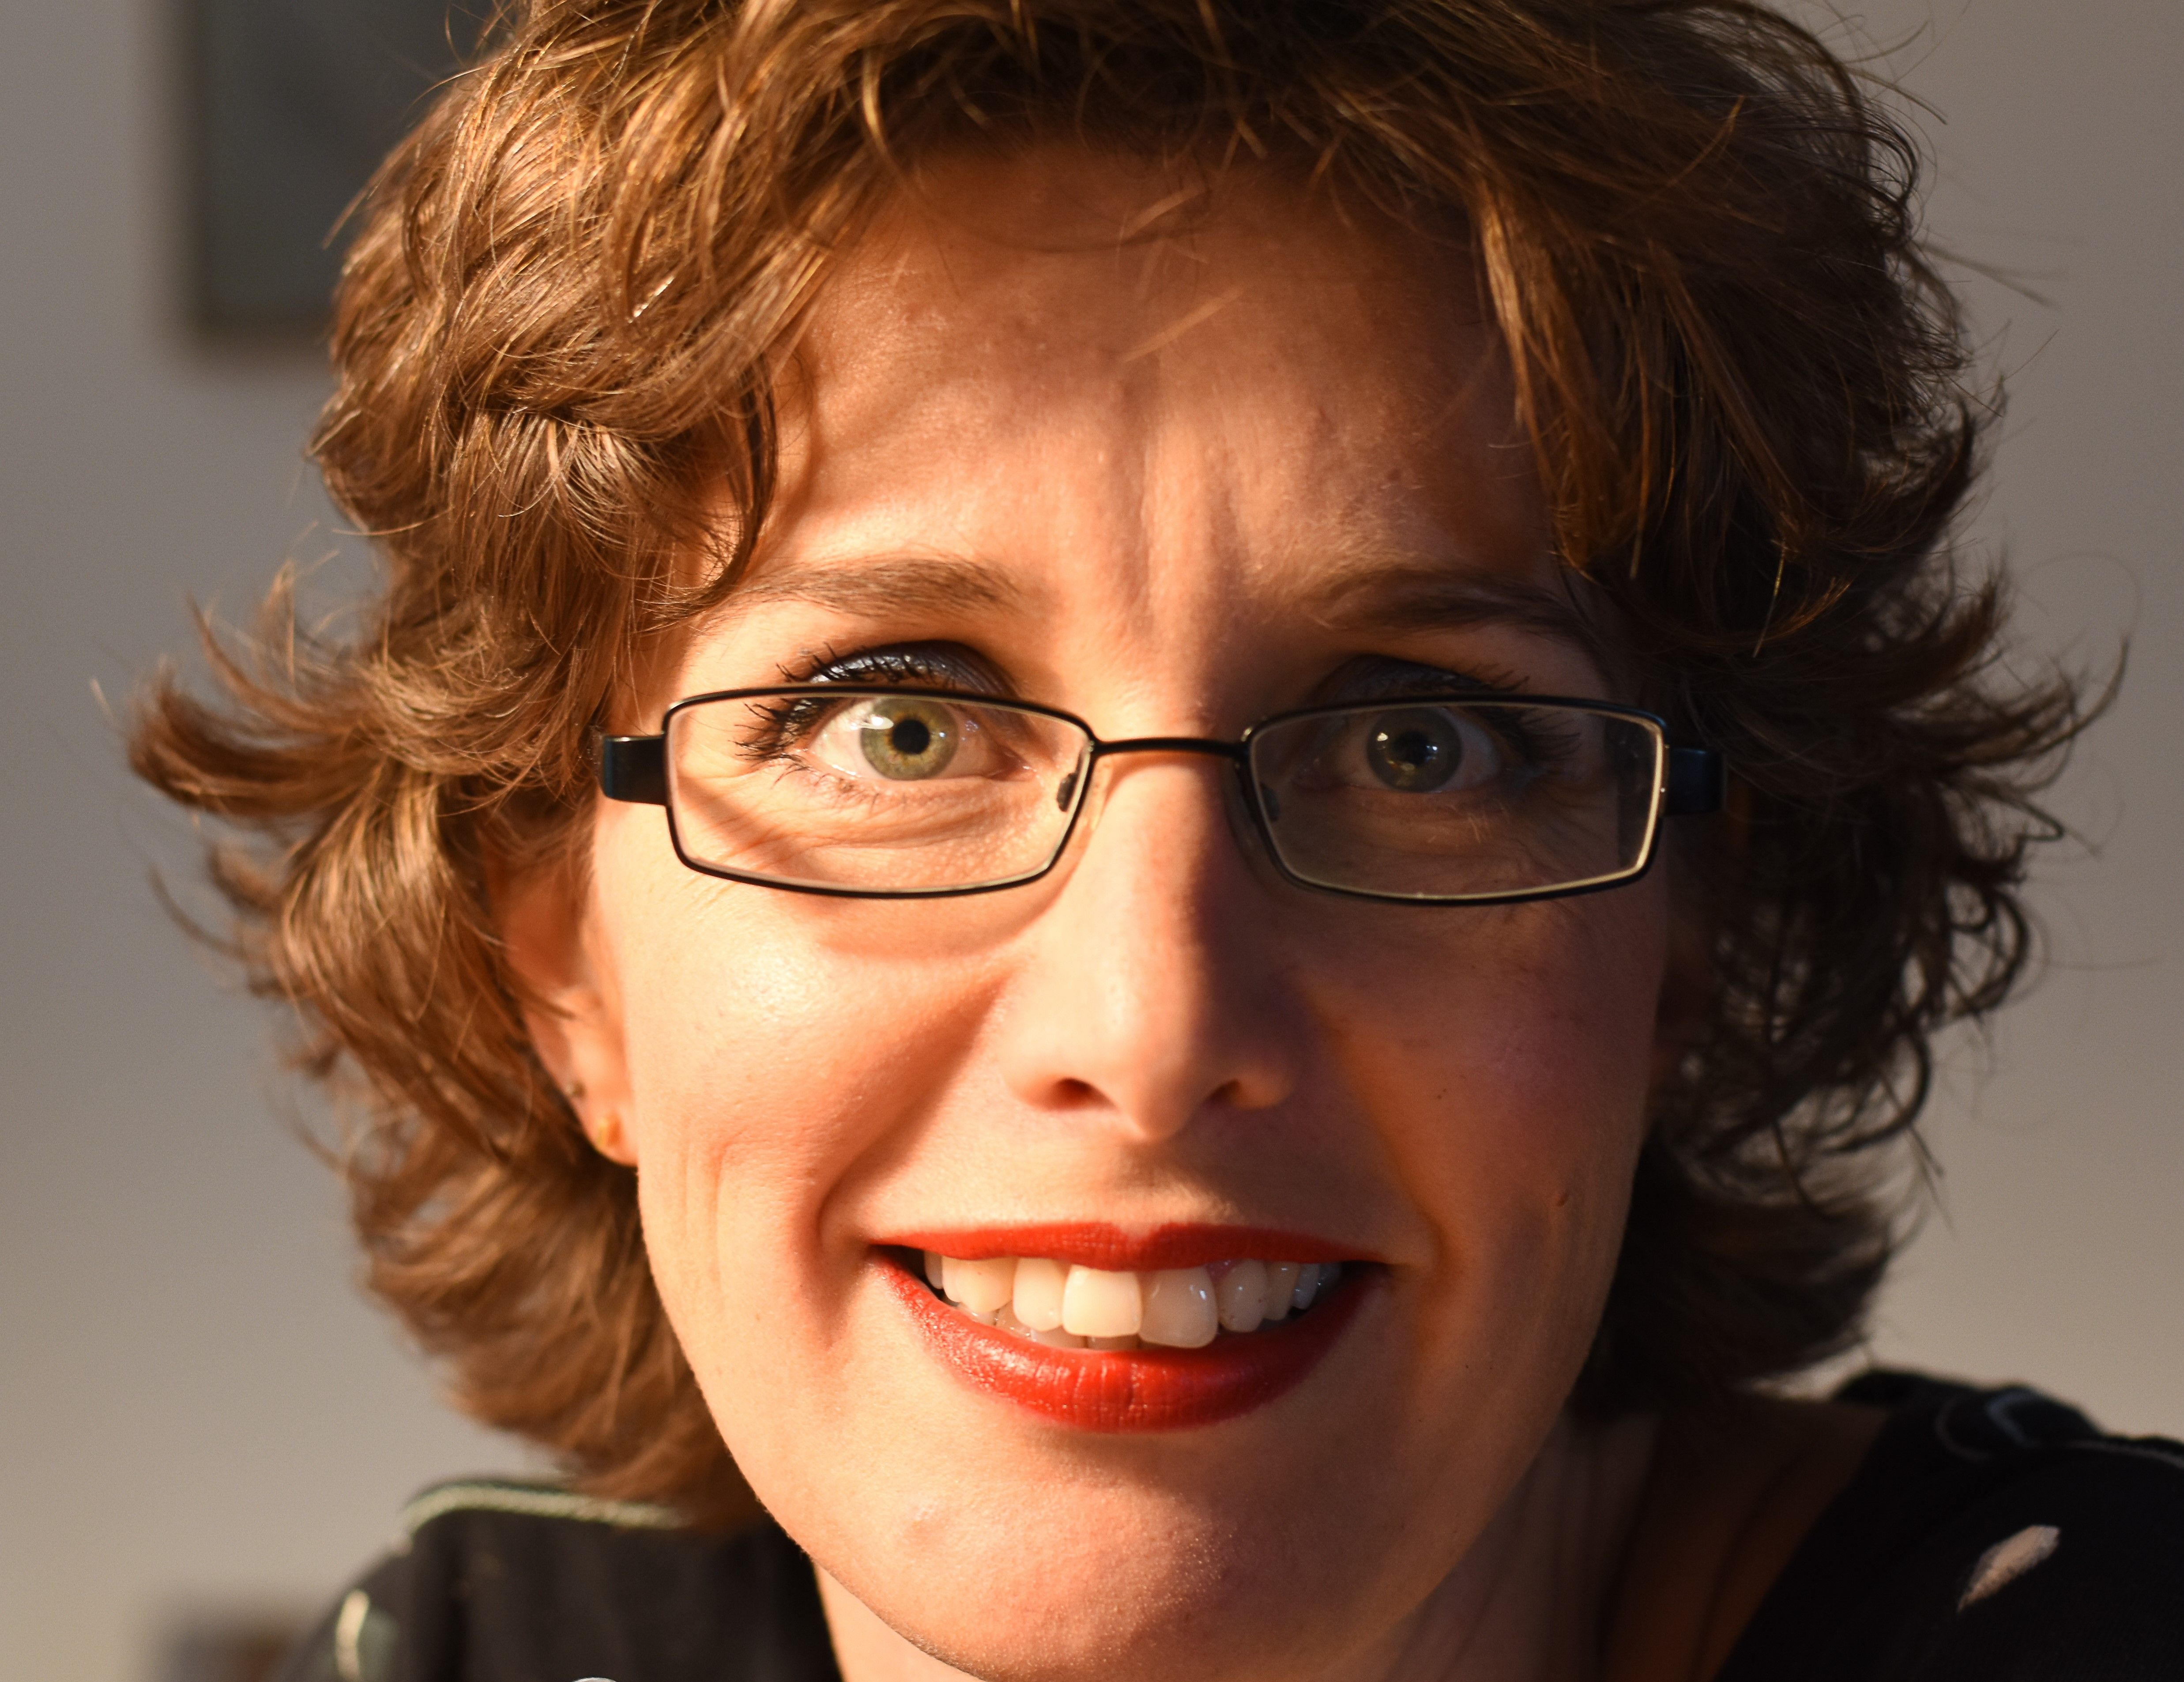 Astrid Paalvast | Ennea consult | www.enneaconsult.nl |  krachtig - zorgvuldig - transformerend